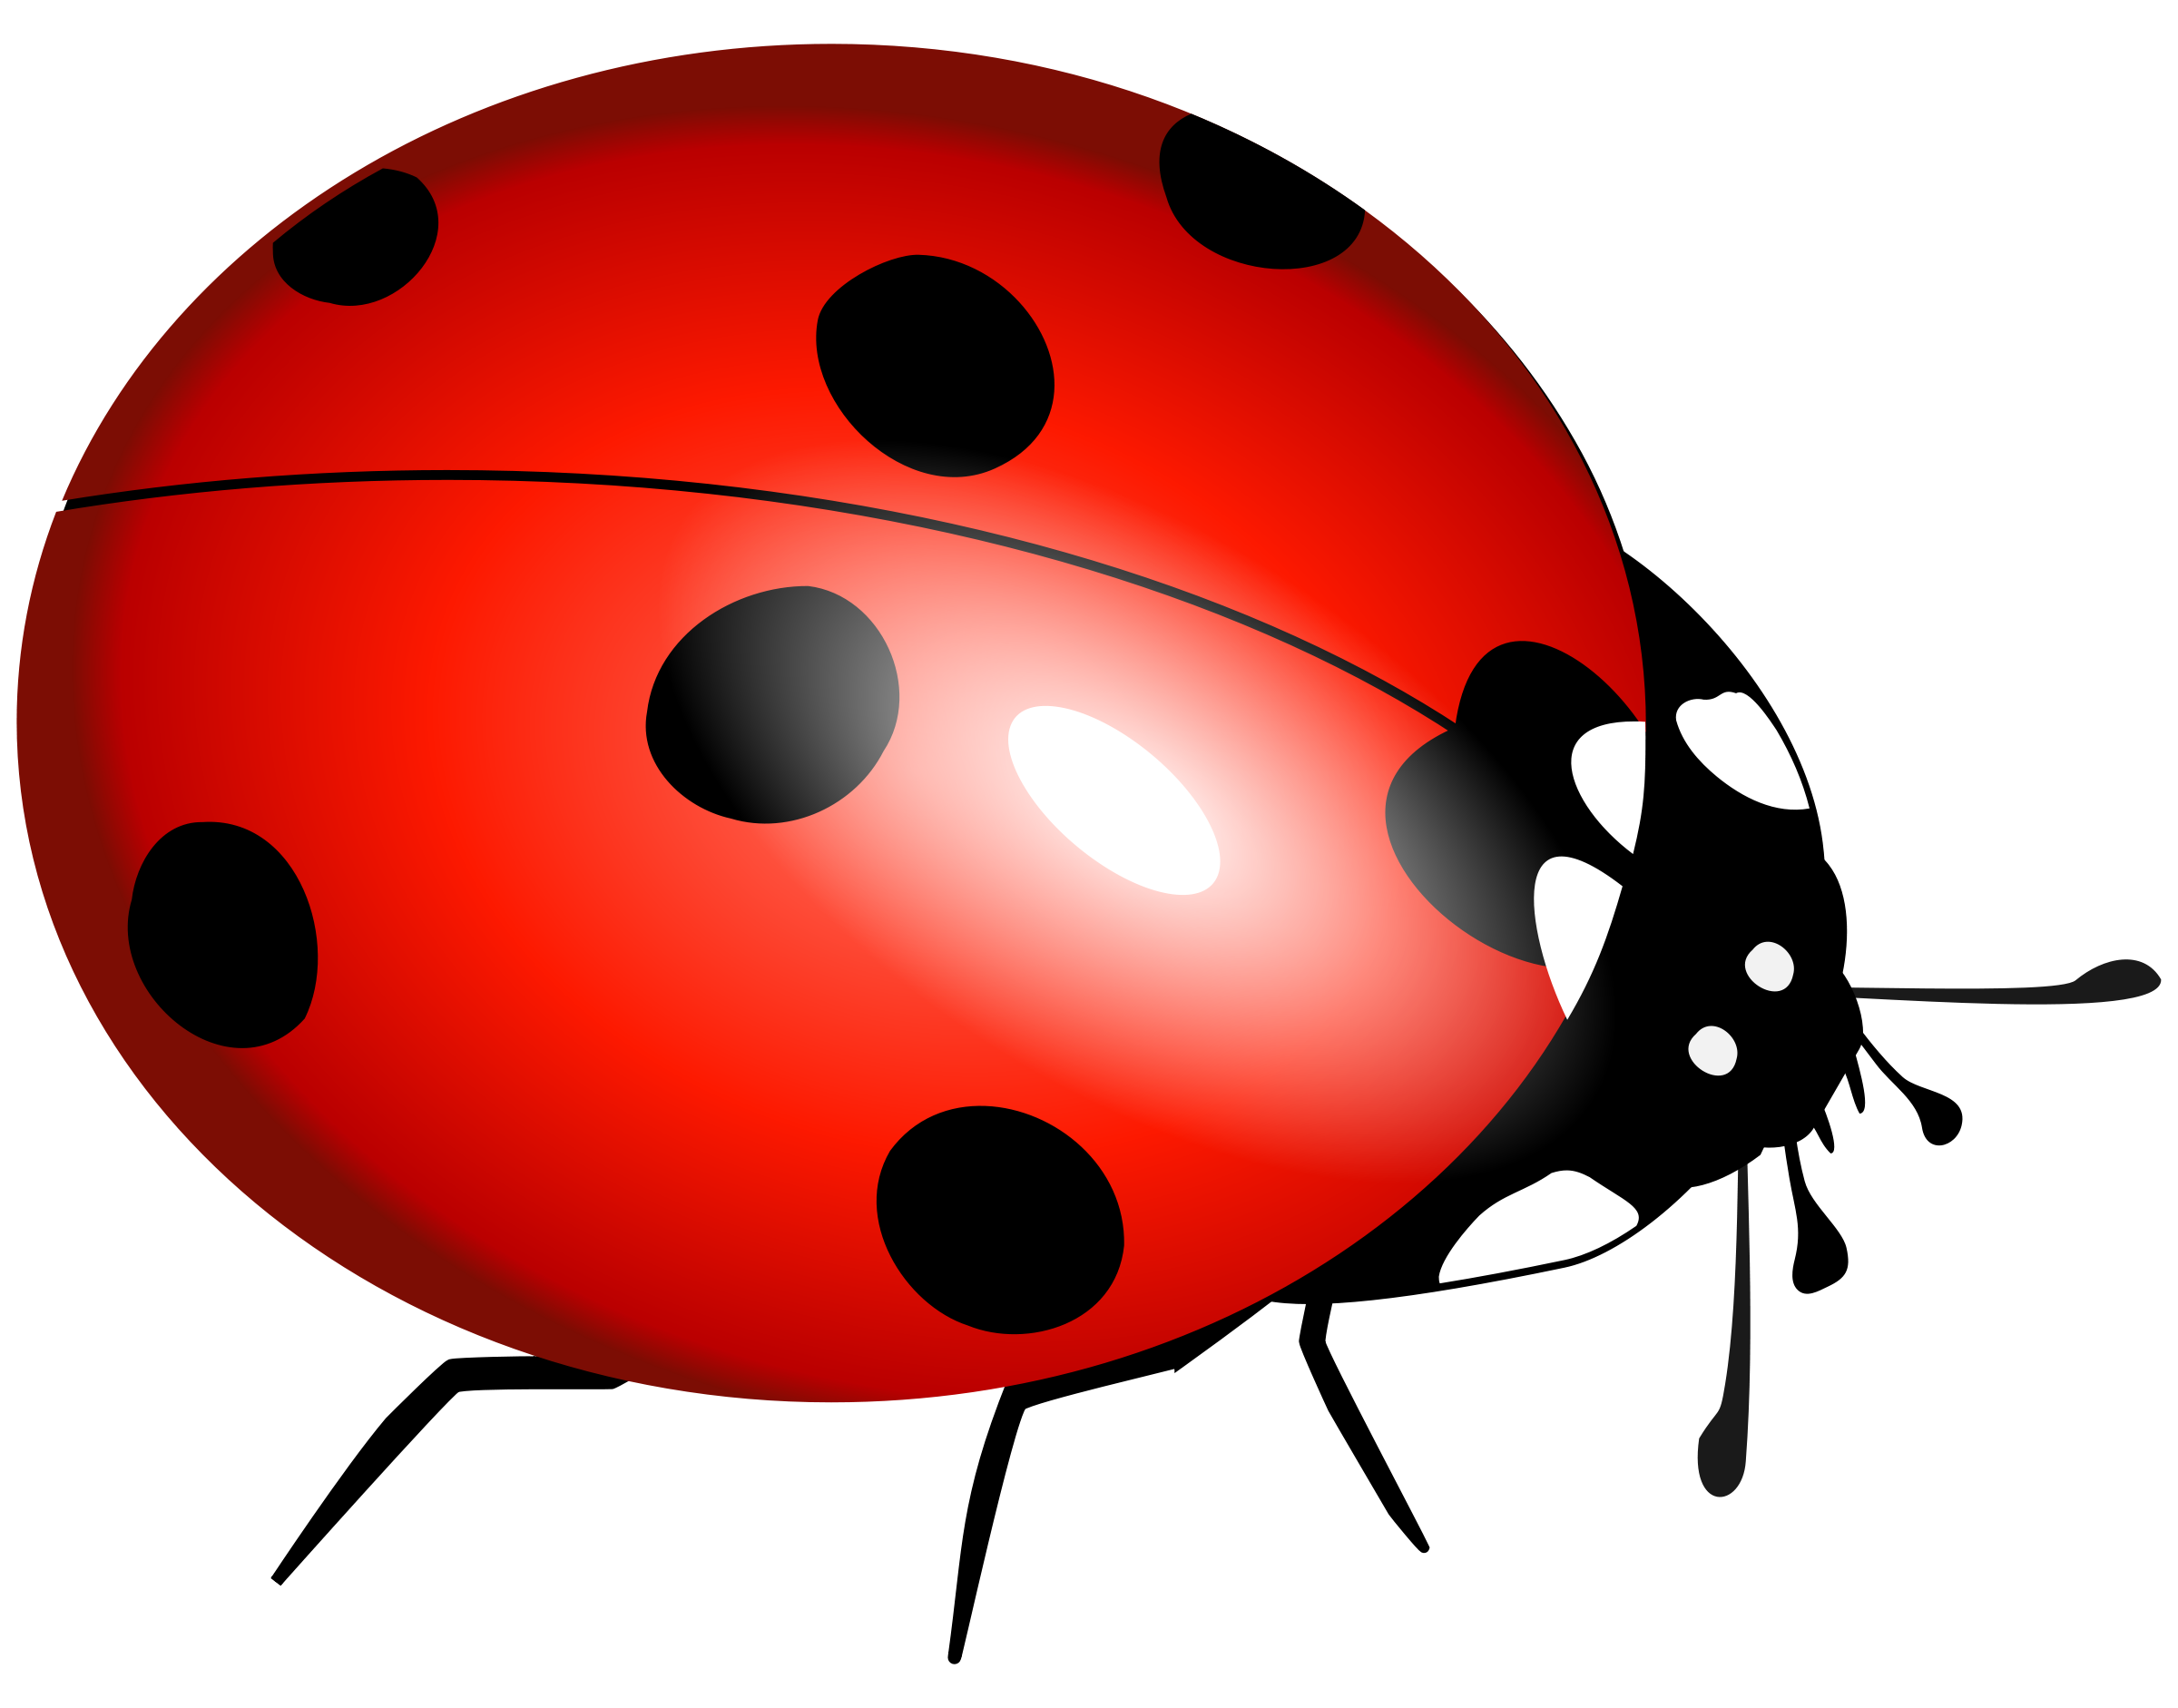 Beelte clipart ladybug Free Ladybug Art image download